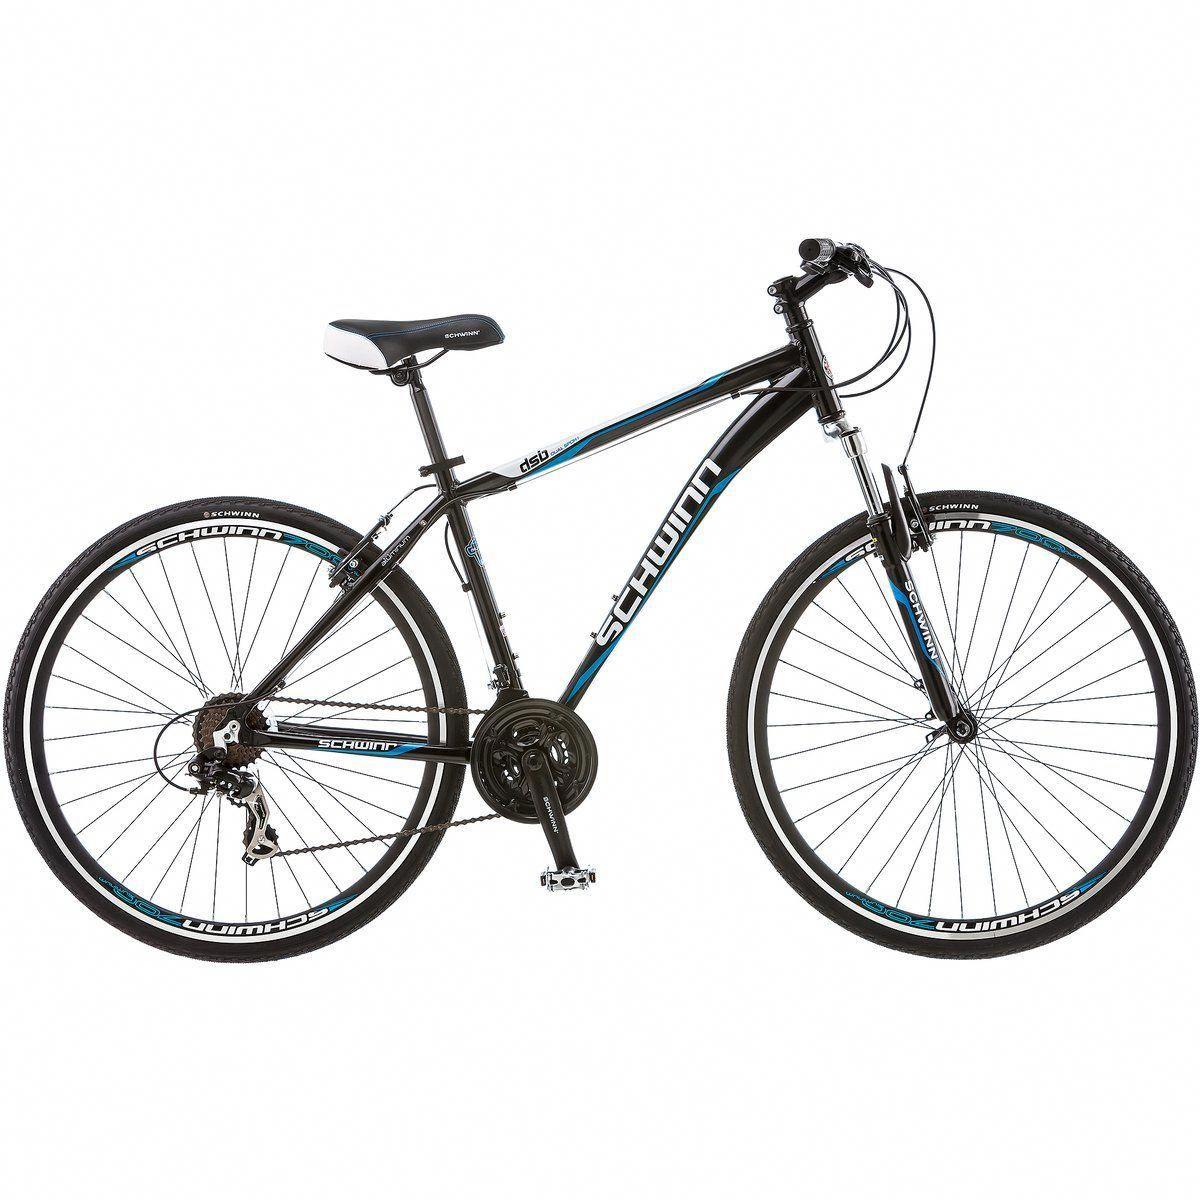 Schwinn Men S Siro 700c Hybrid Bicycle Is The Best Bike For